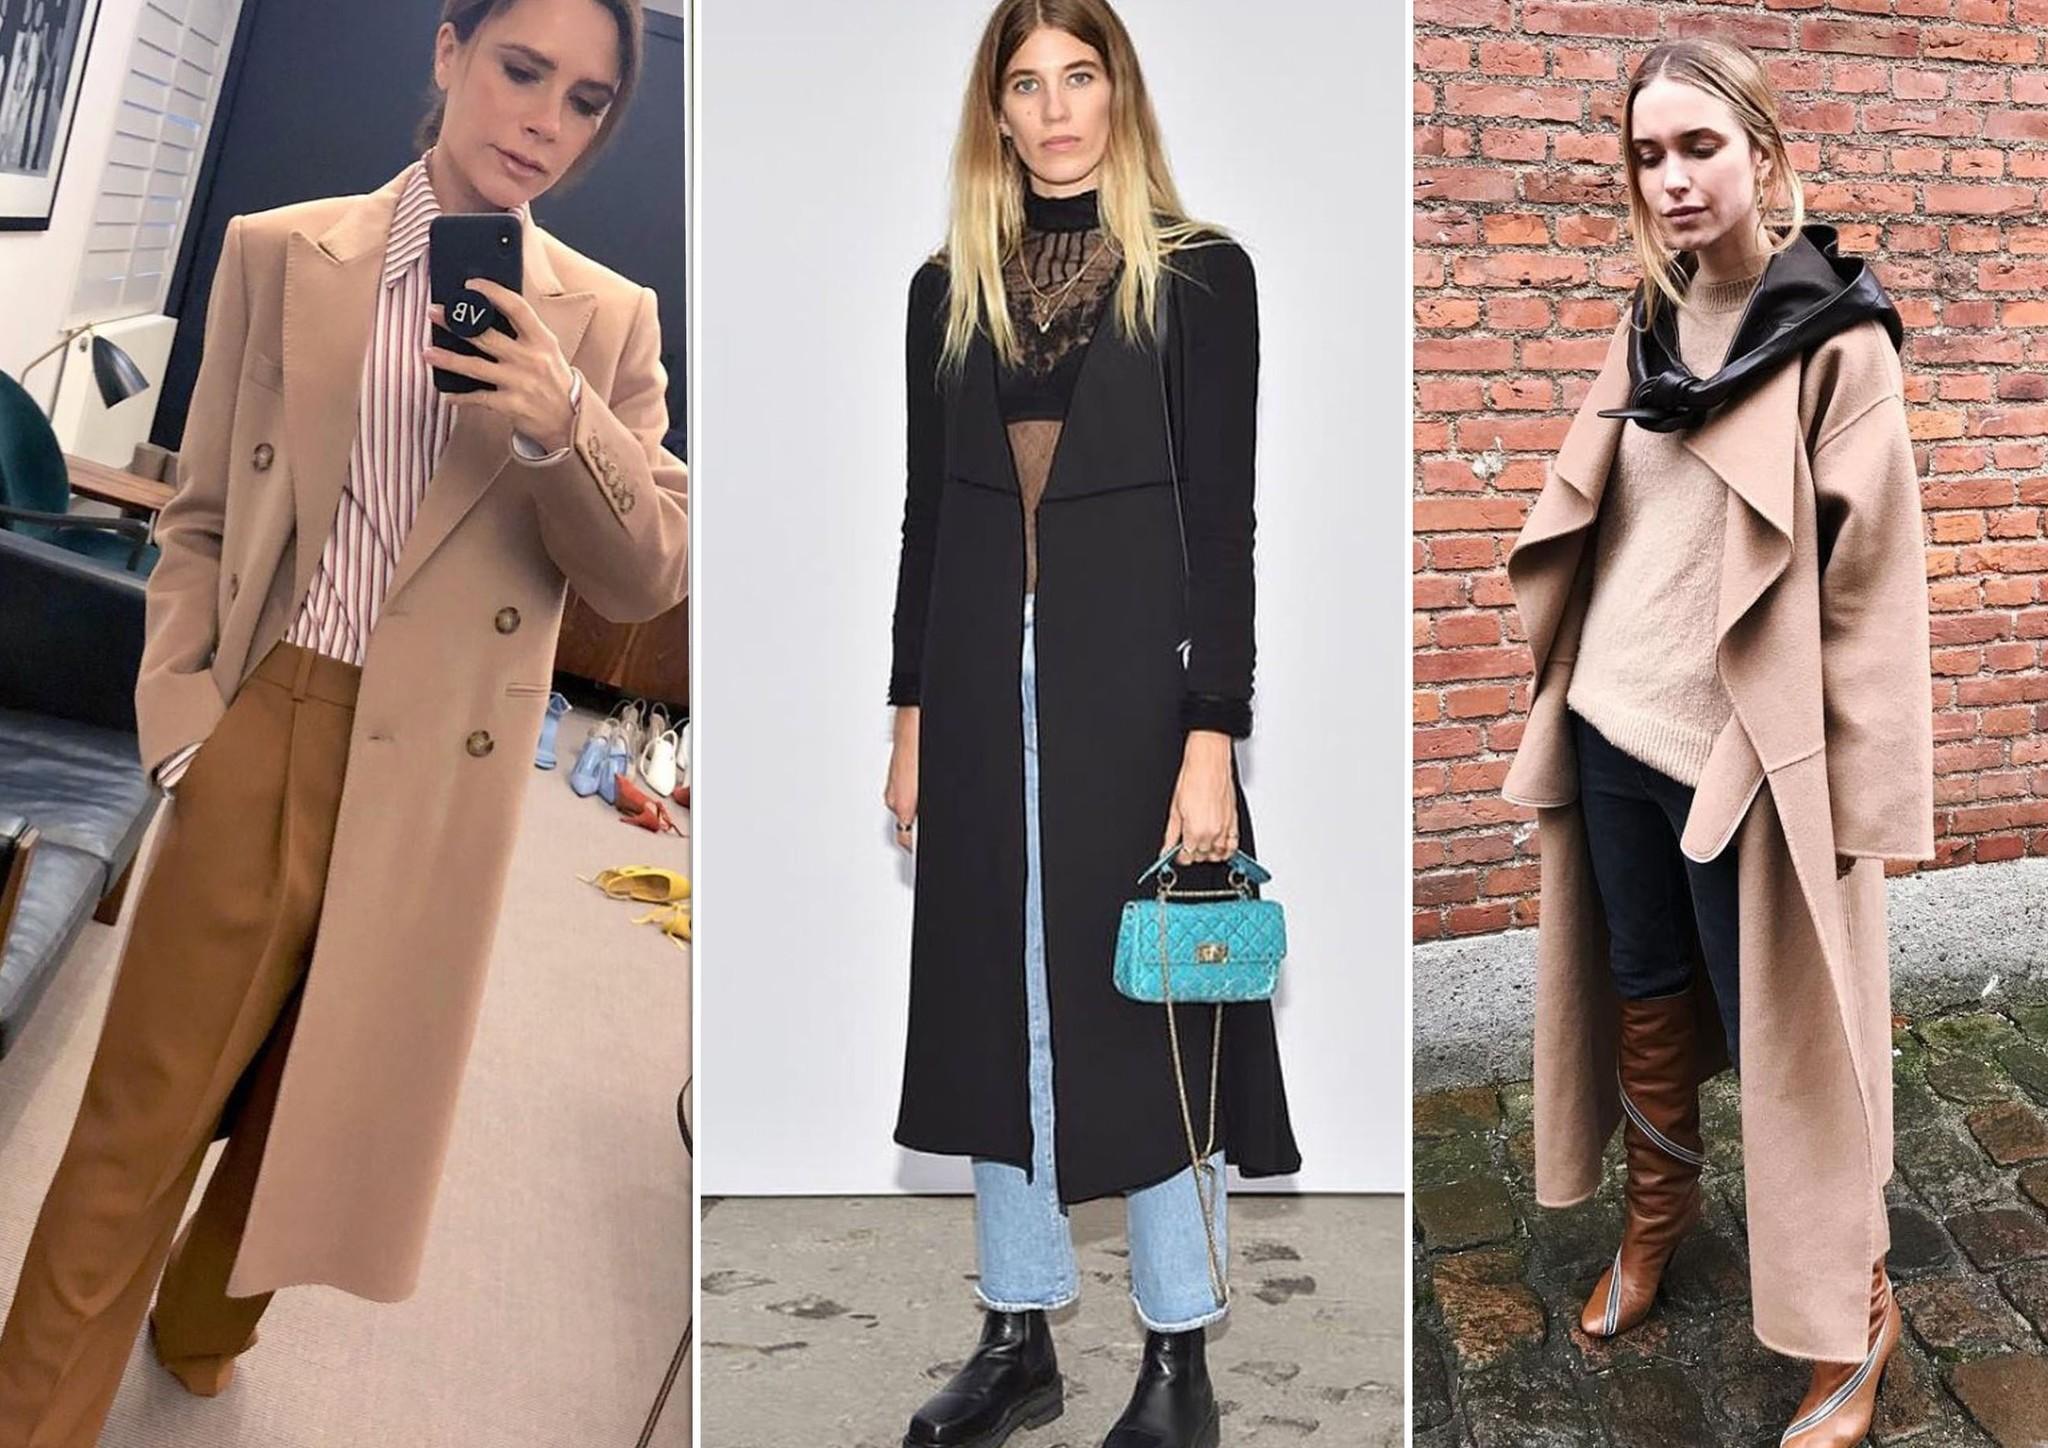 La semana en looks: Victoria Beckham, Veronika Heilbrunner y Pernille...